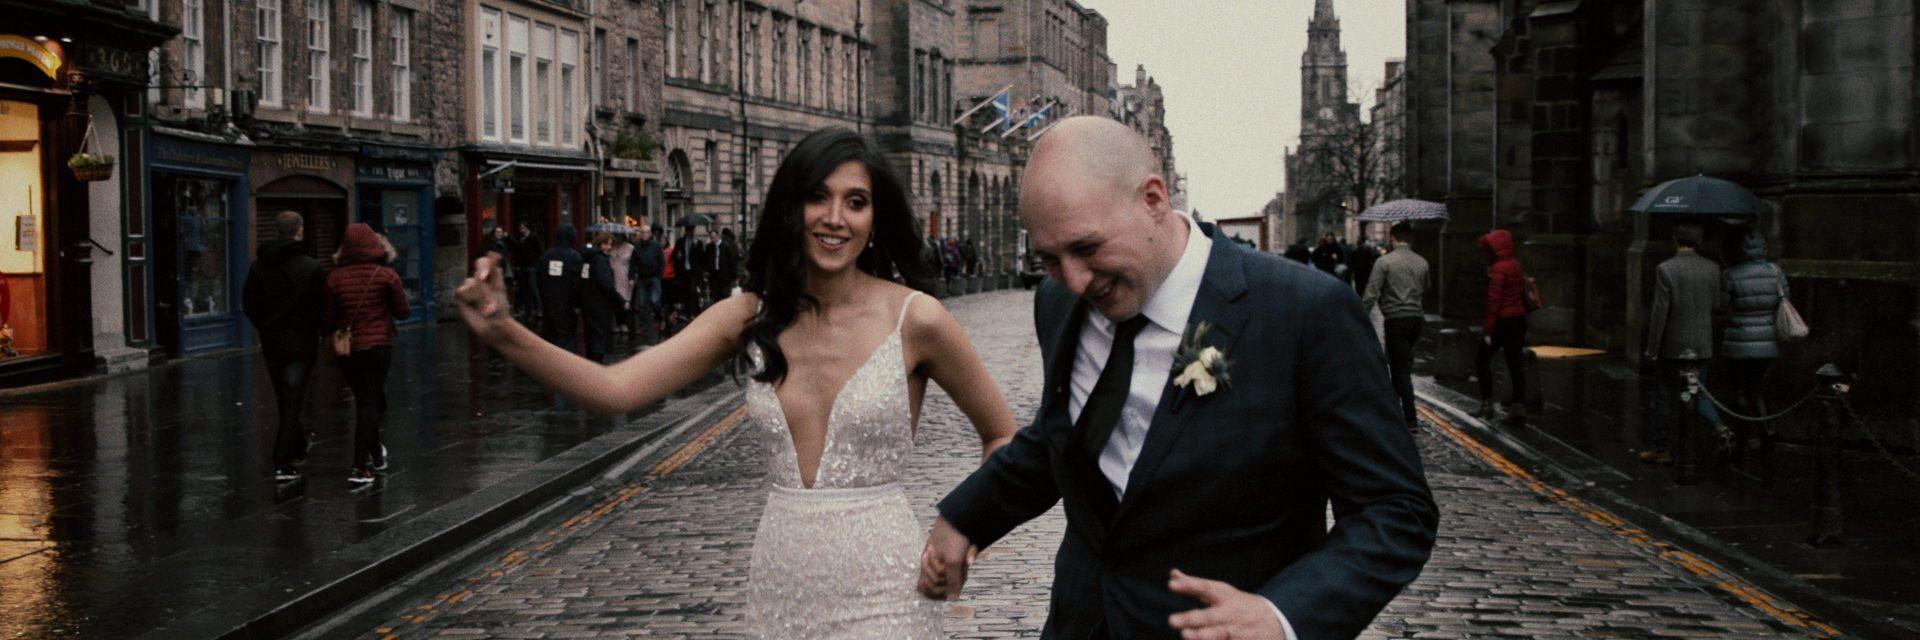 Bergen-wedding-videographer-cinemate-films-04